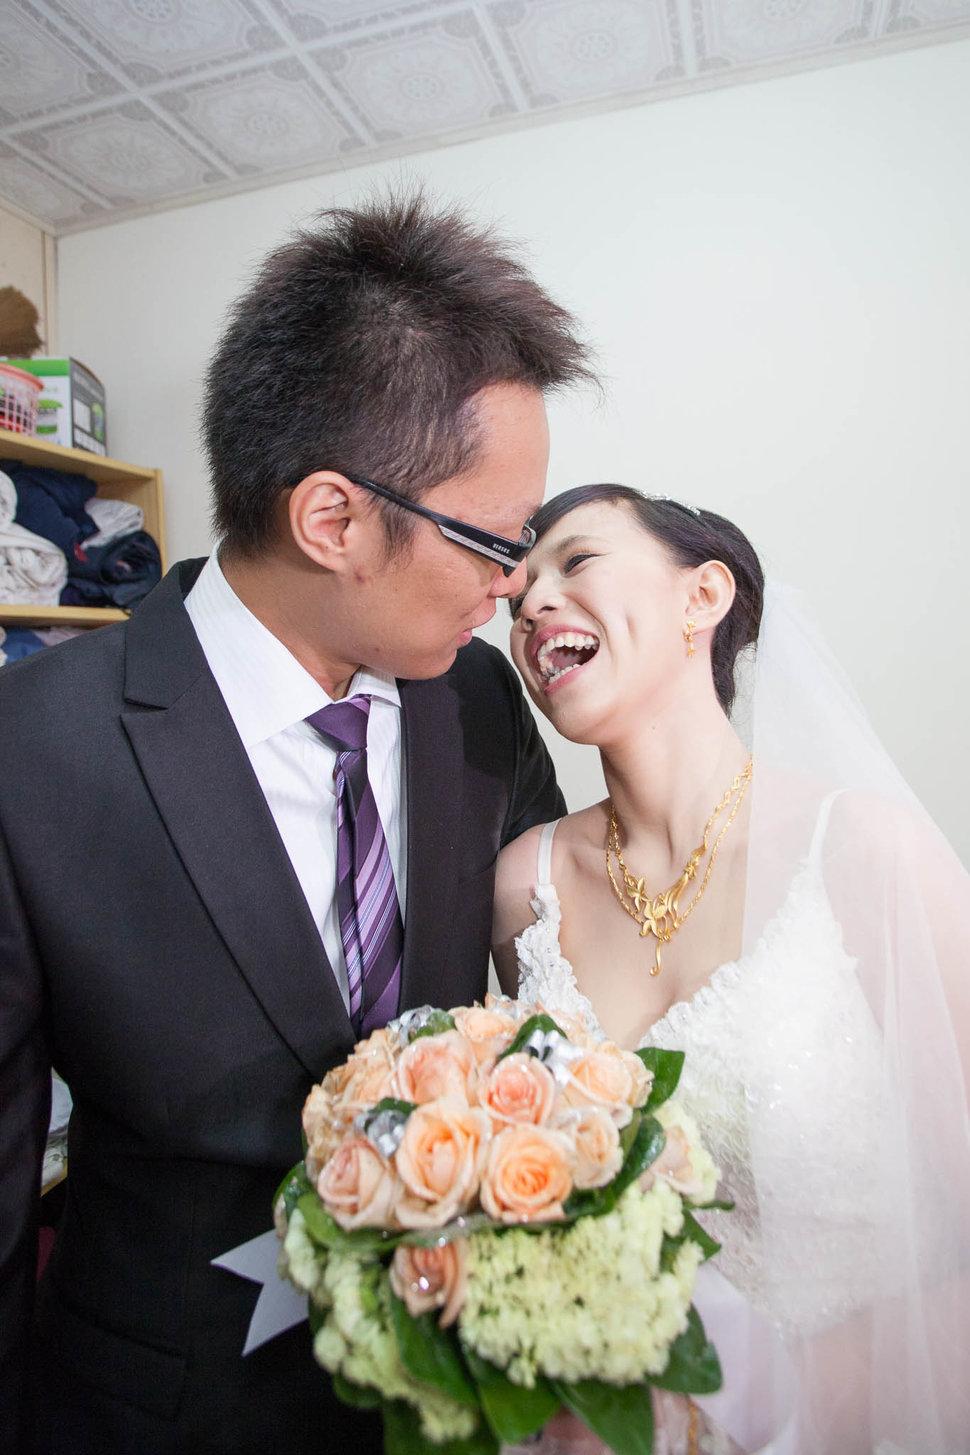 18PHOTO-青蛙王子娶新娘❤️(編號:218631) - 18PHOTO 婚紗影像攝影工作室 - 結婚吧